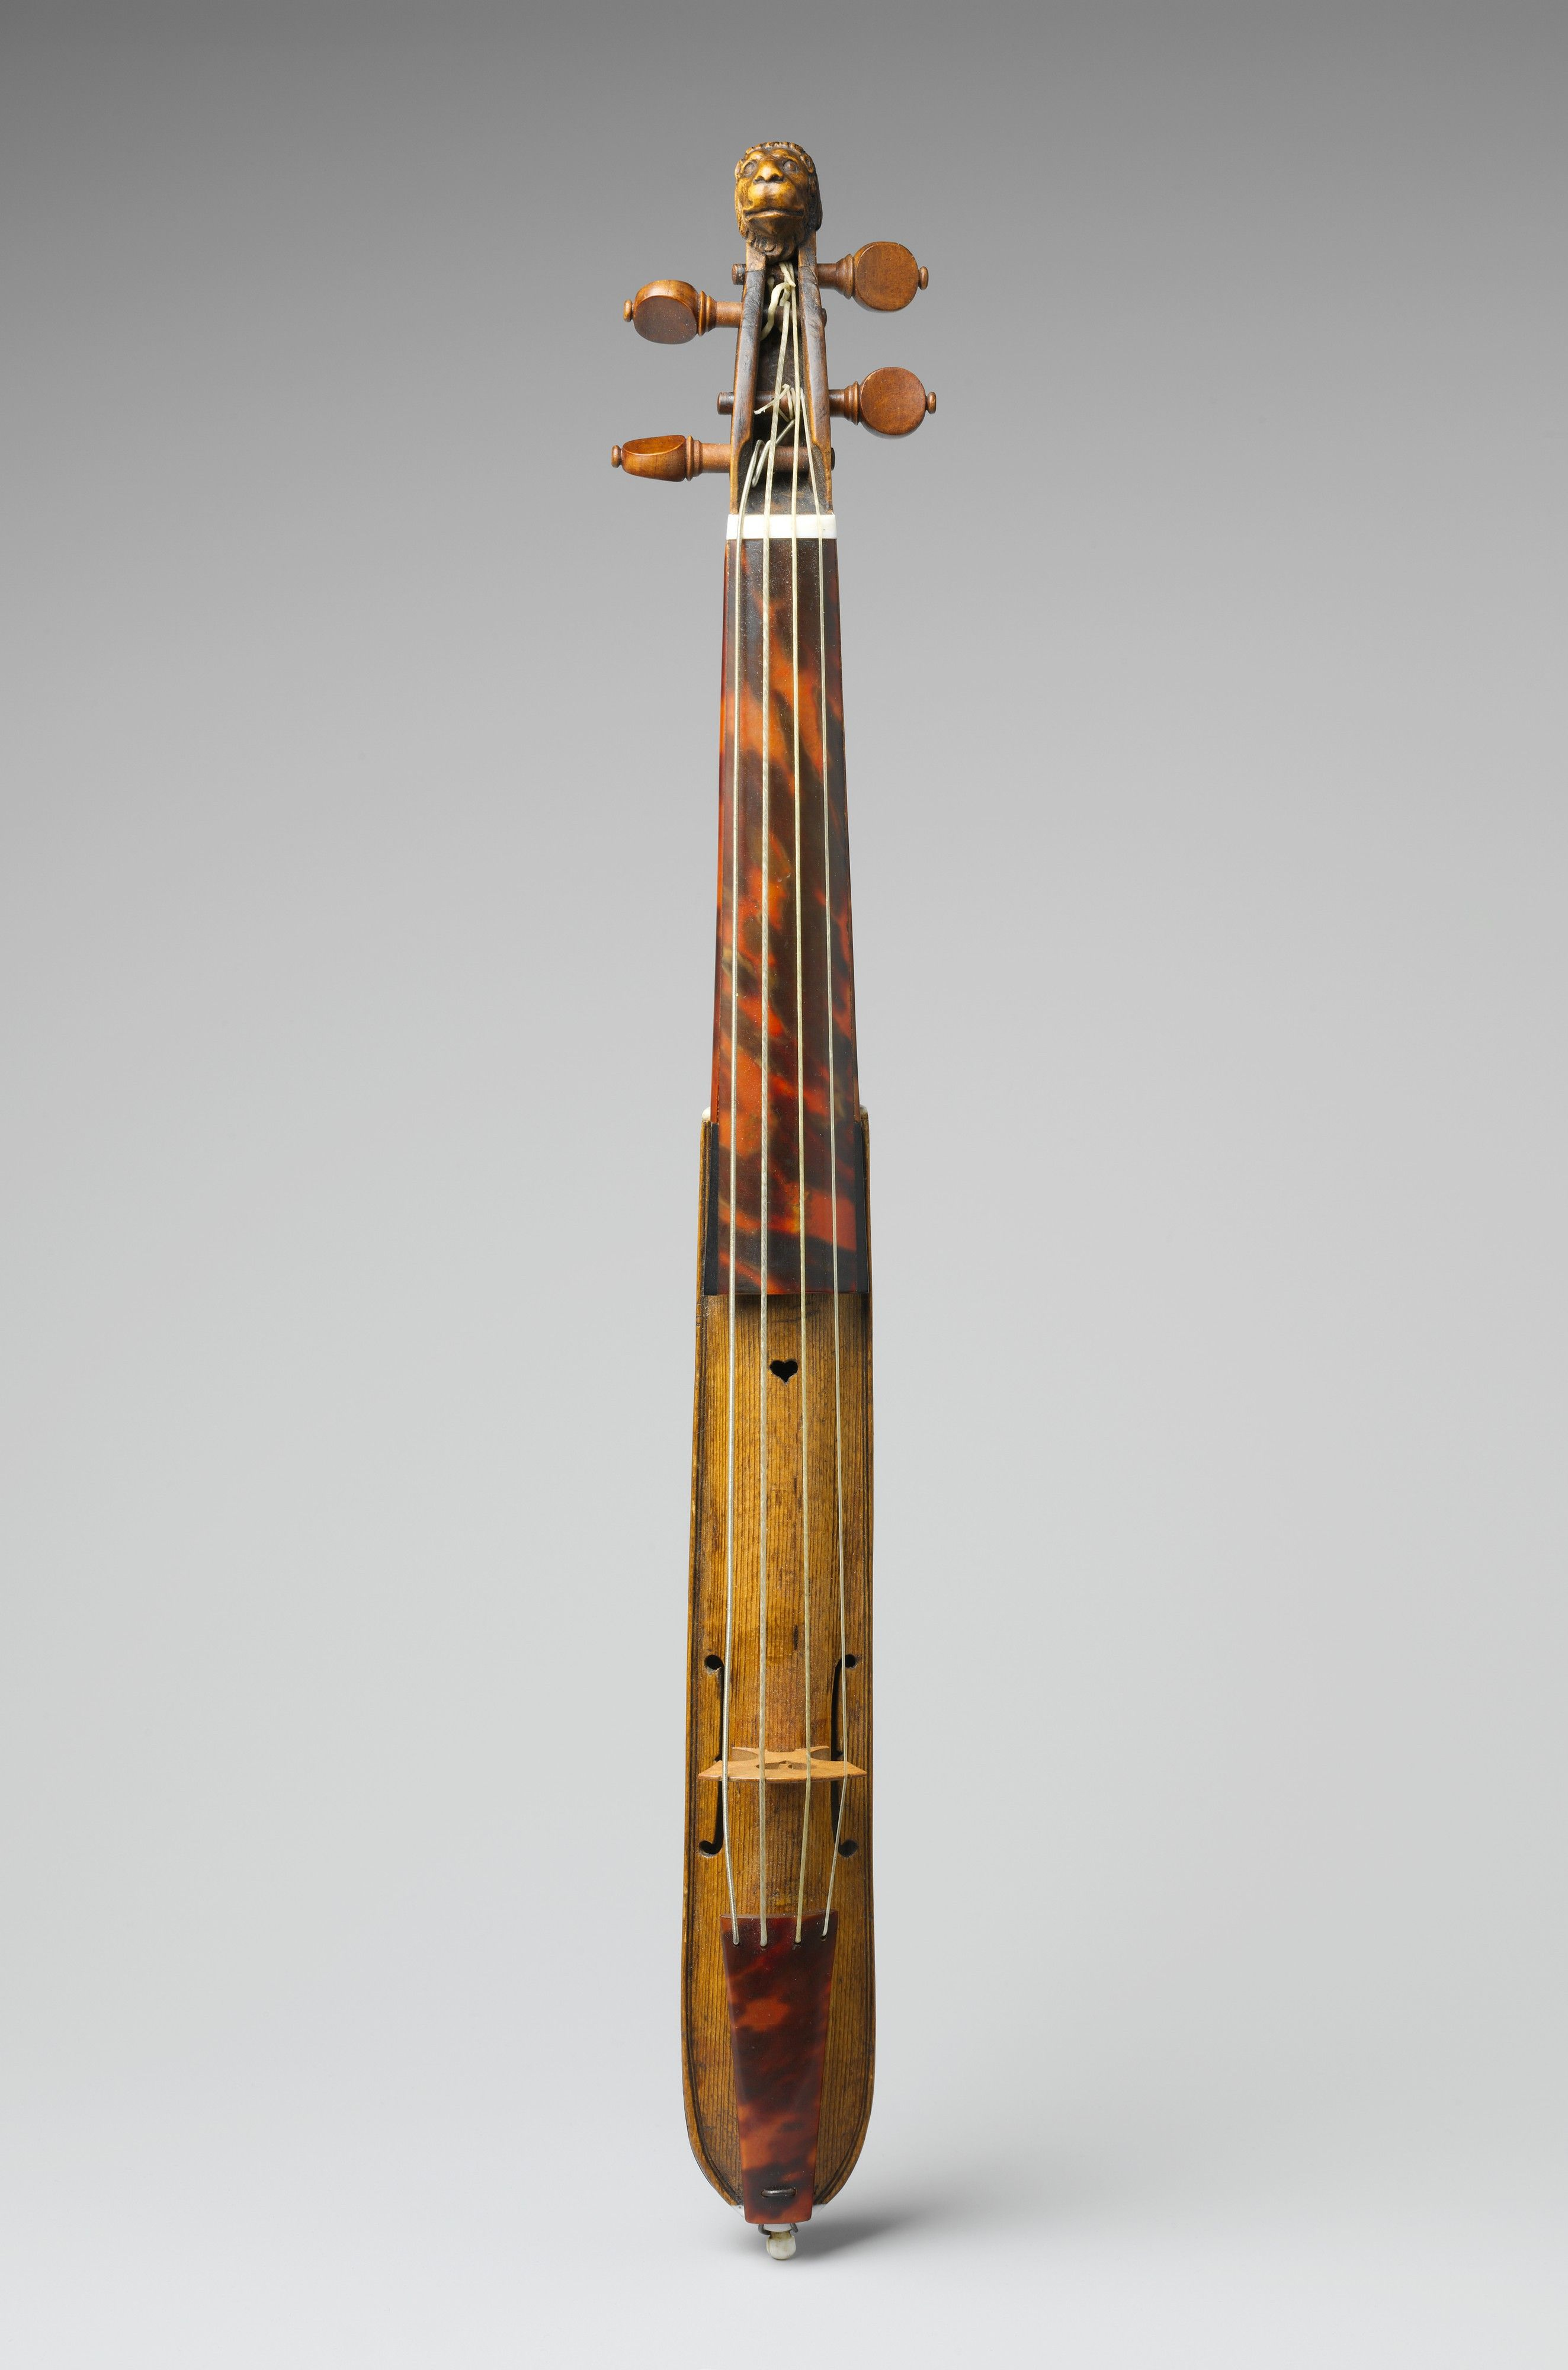 Pin On Ceramic Instruments